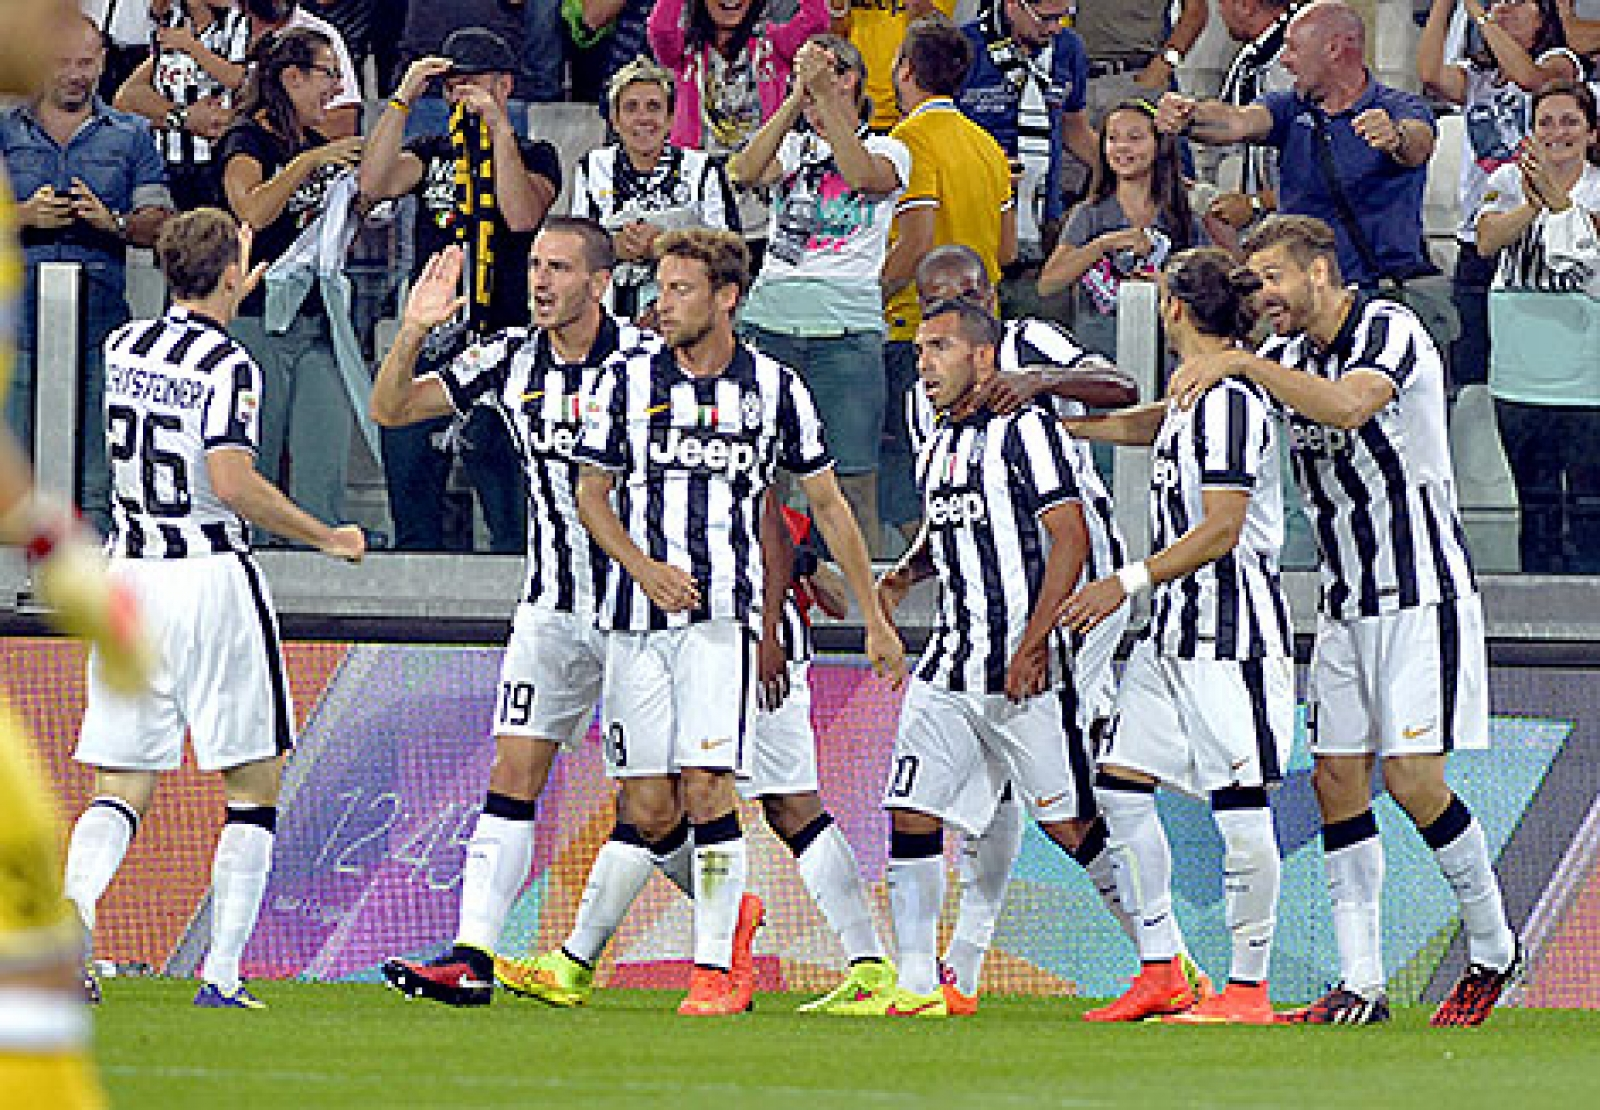 Juventus tvingas byta trojor